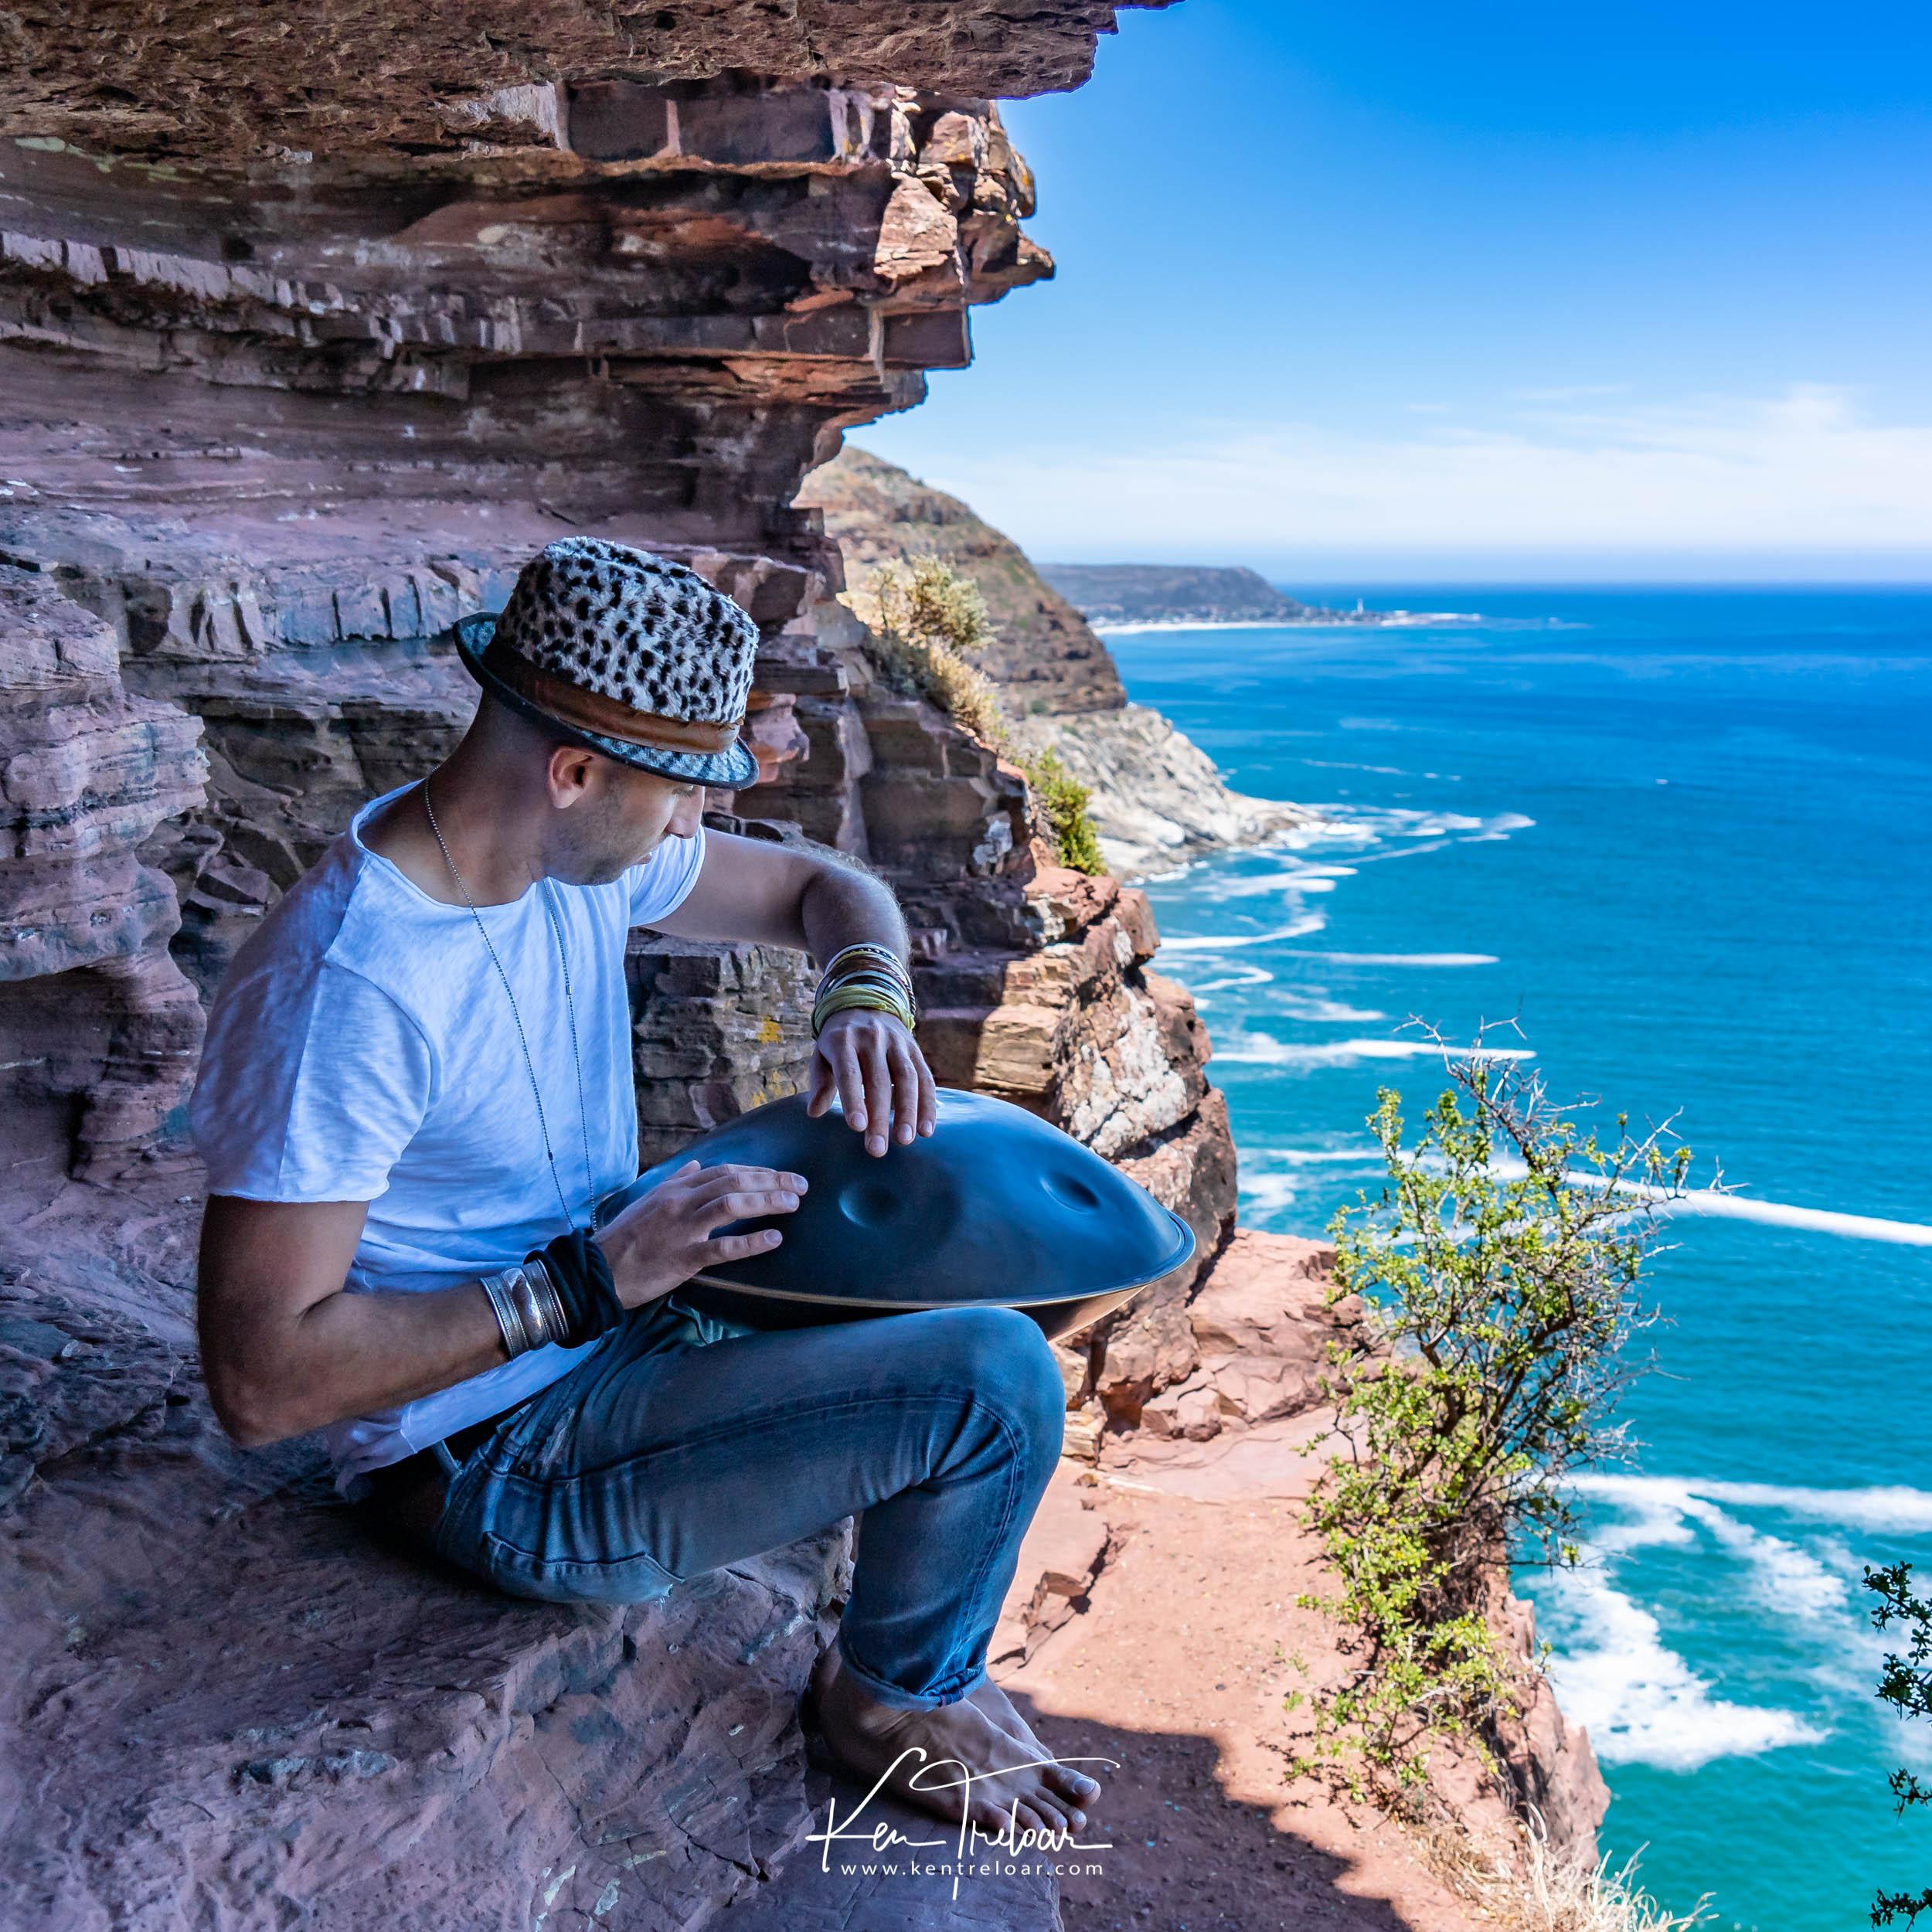 Marci Selvaggio - Hang Instrument Cape Town Tour - South Afica - Chapmans Peak Drive - Image by Ken Treloar-5.jpg